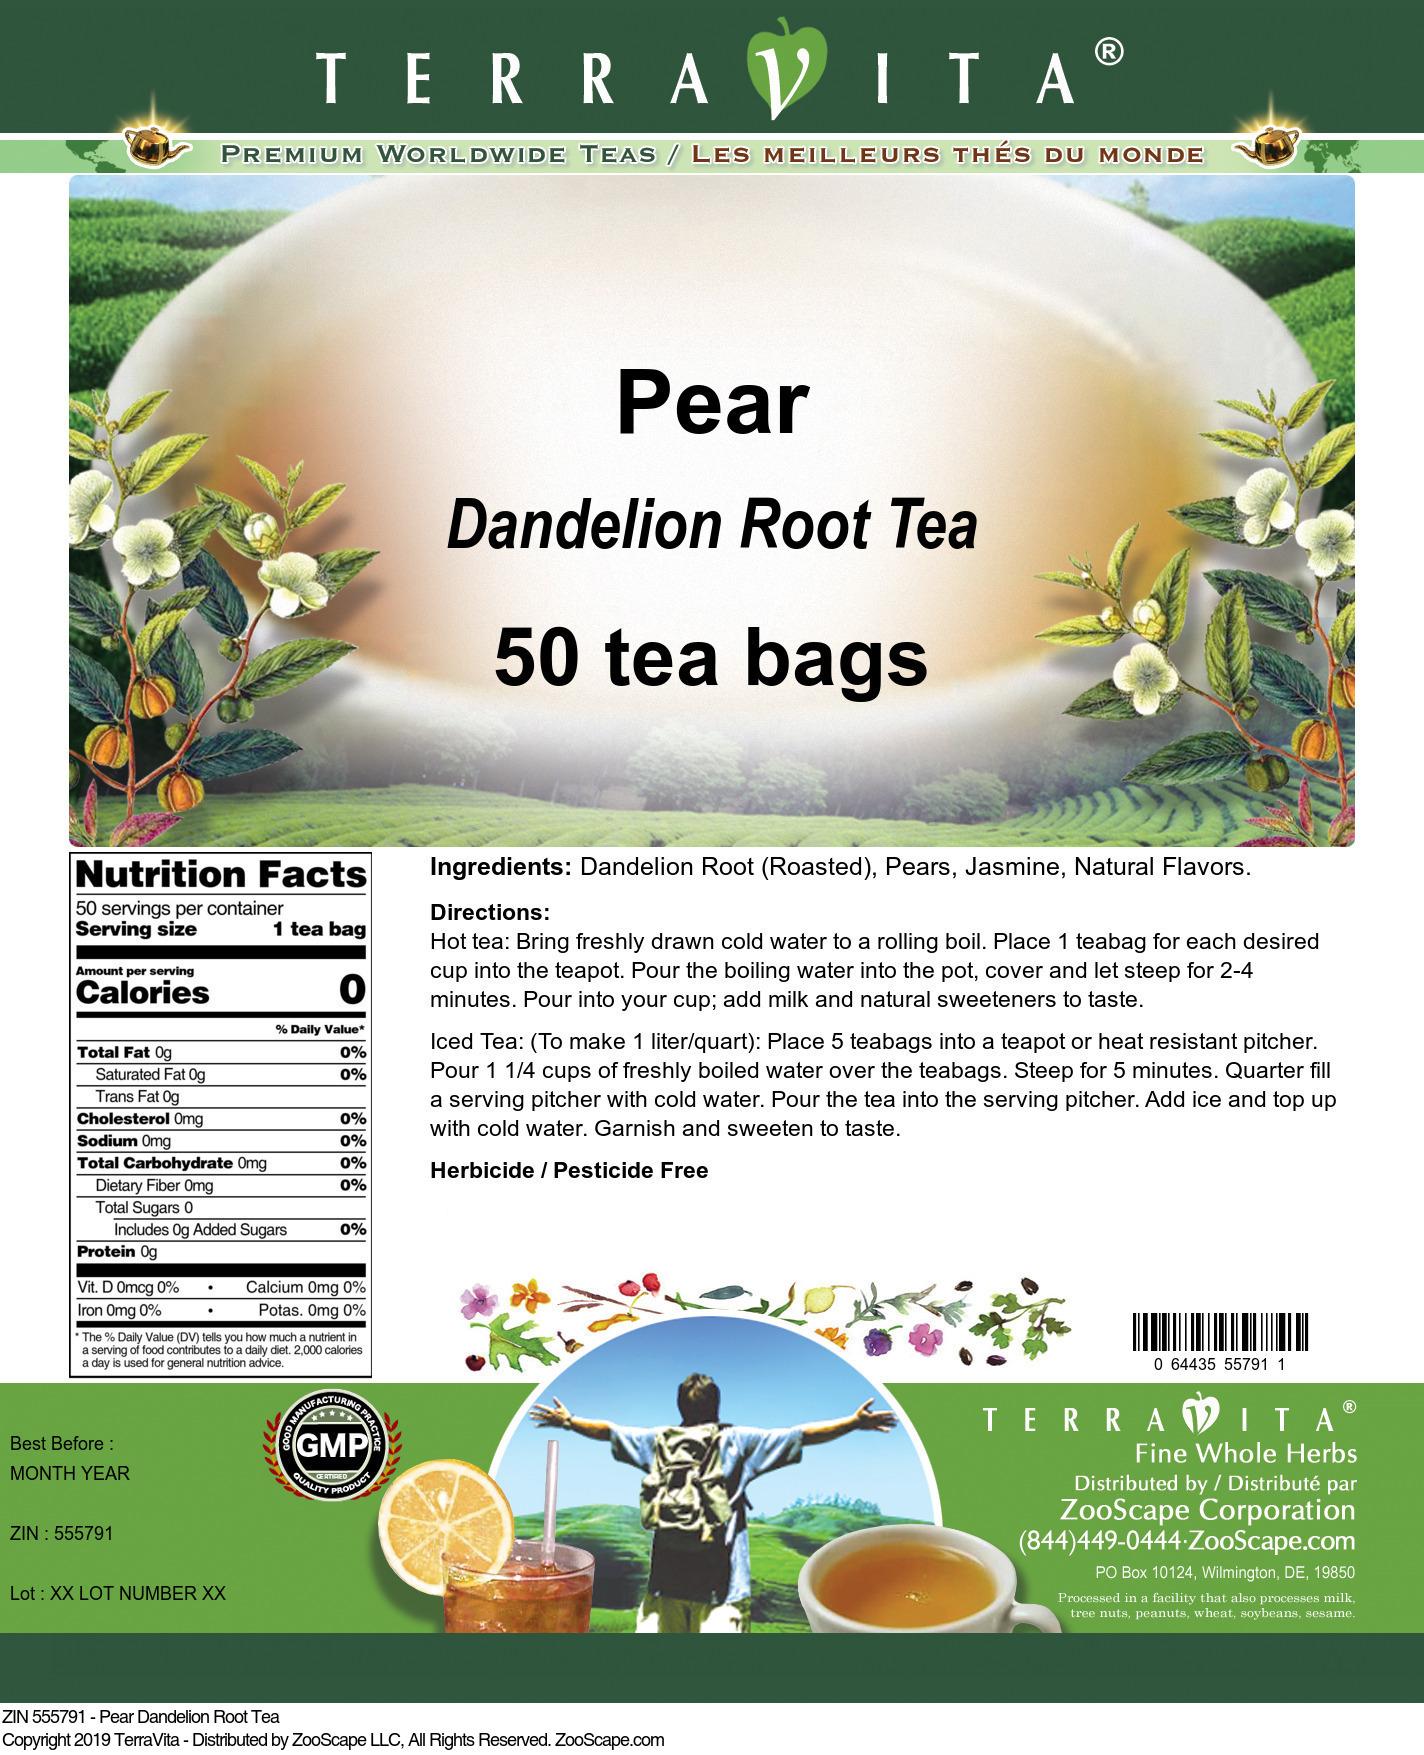 Pear Dandelion Root Tea